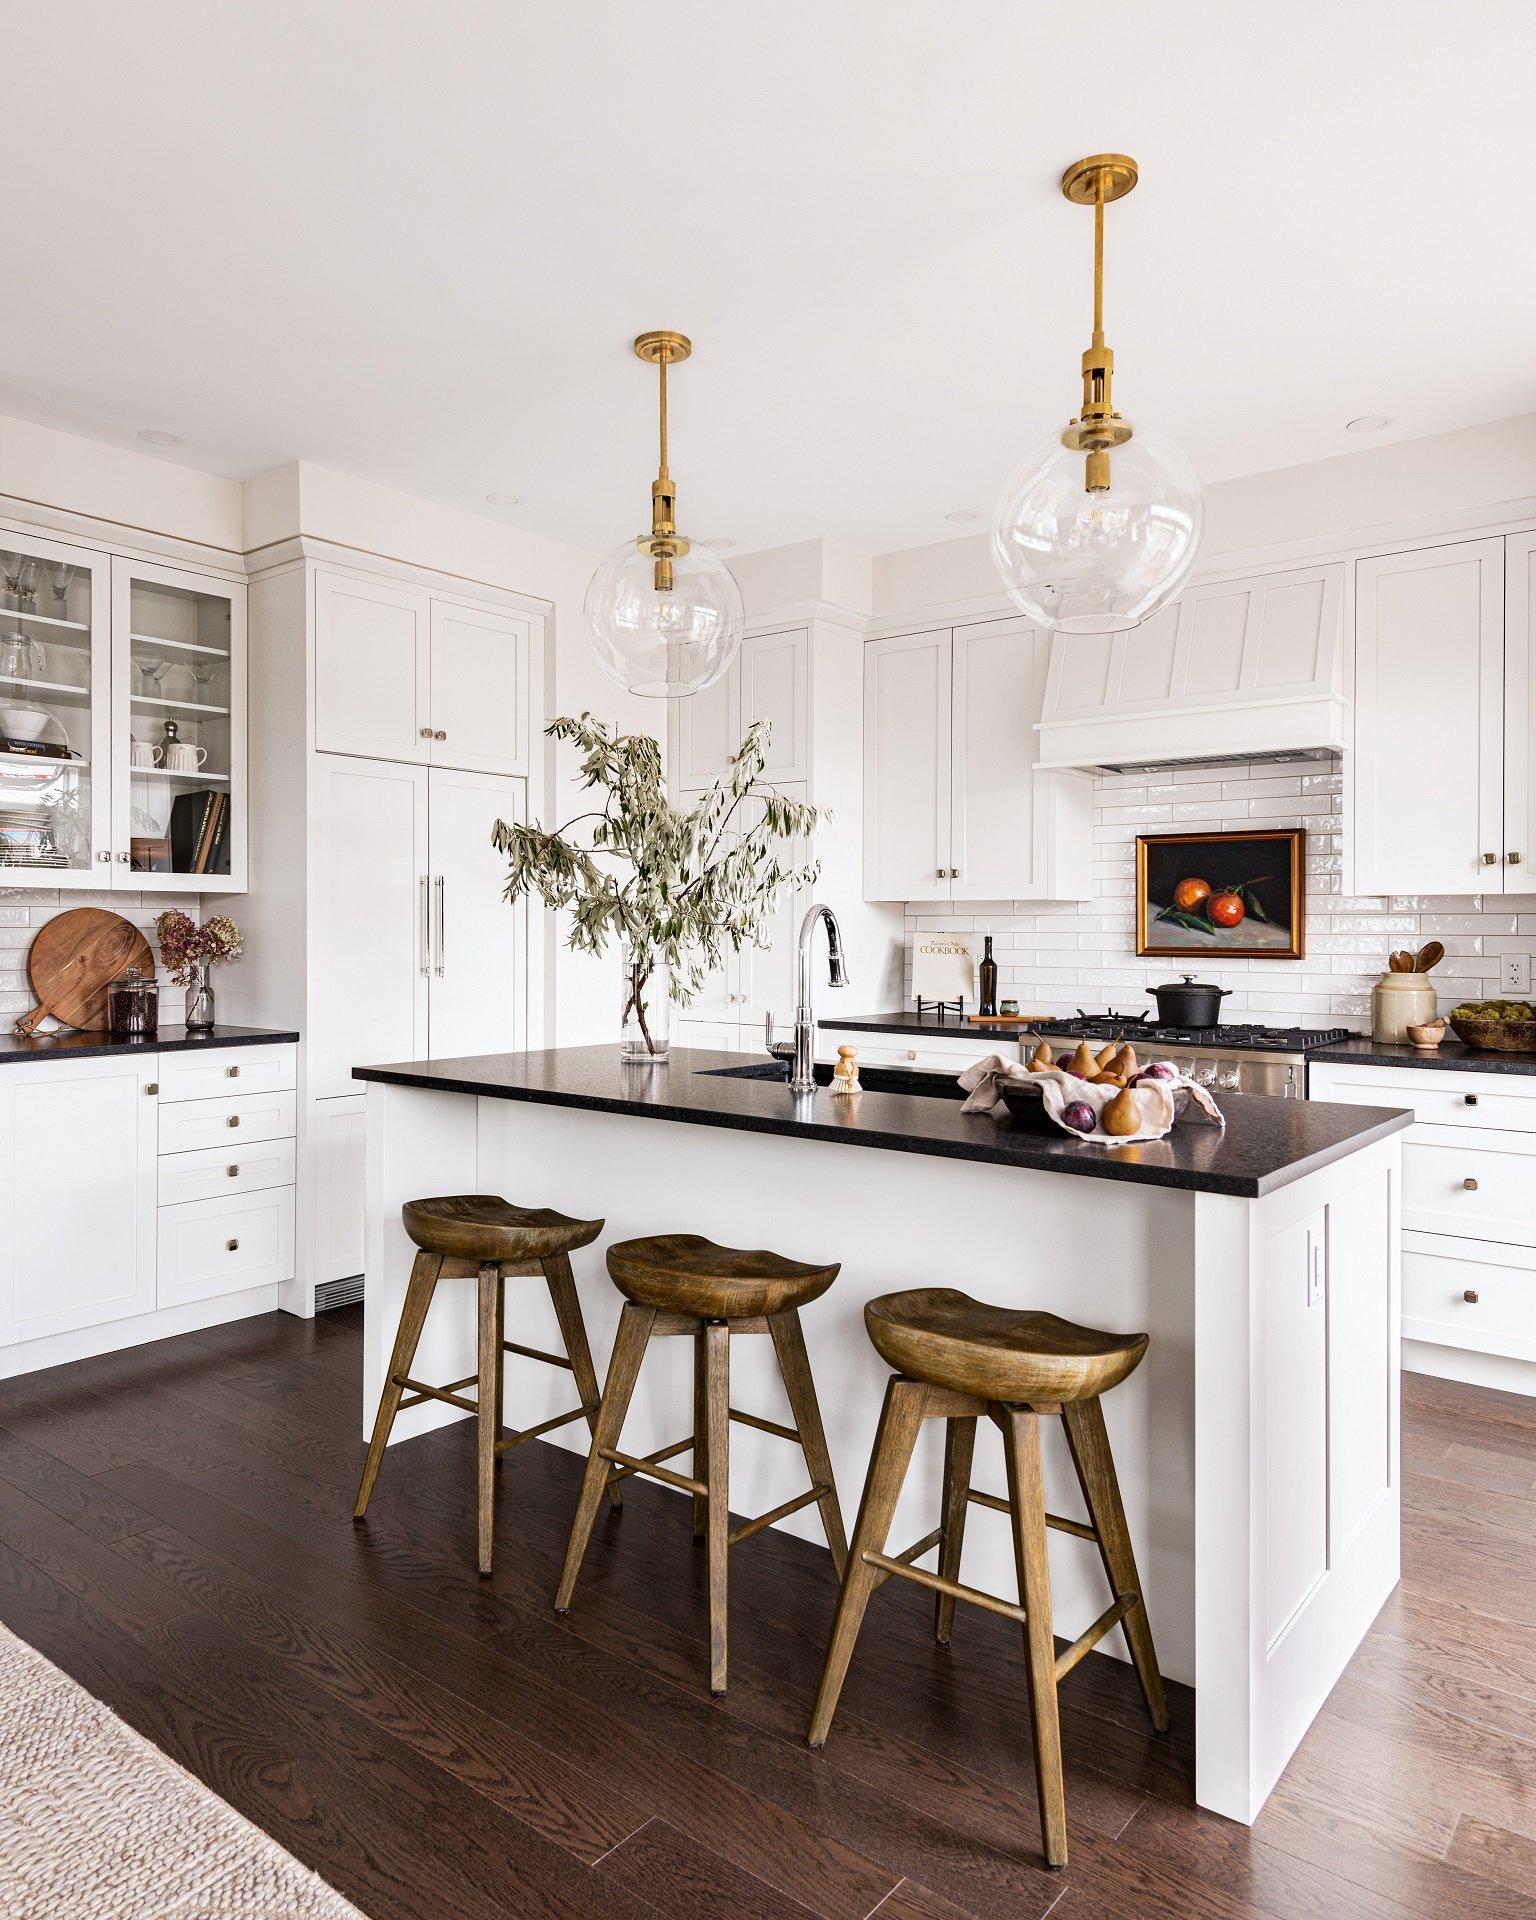 A custom kitchen design by Deslaurier